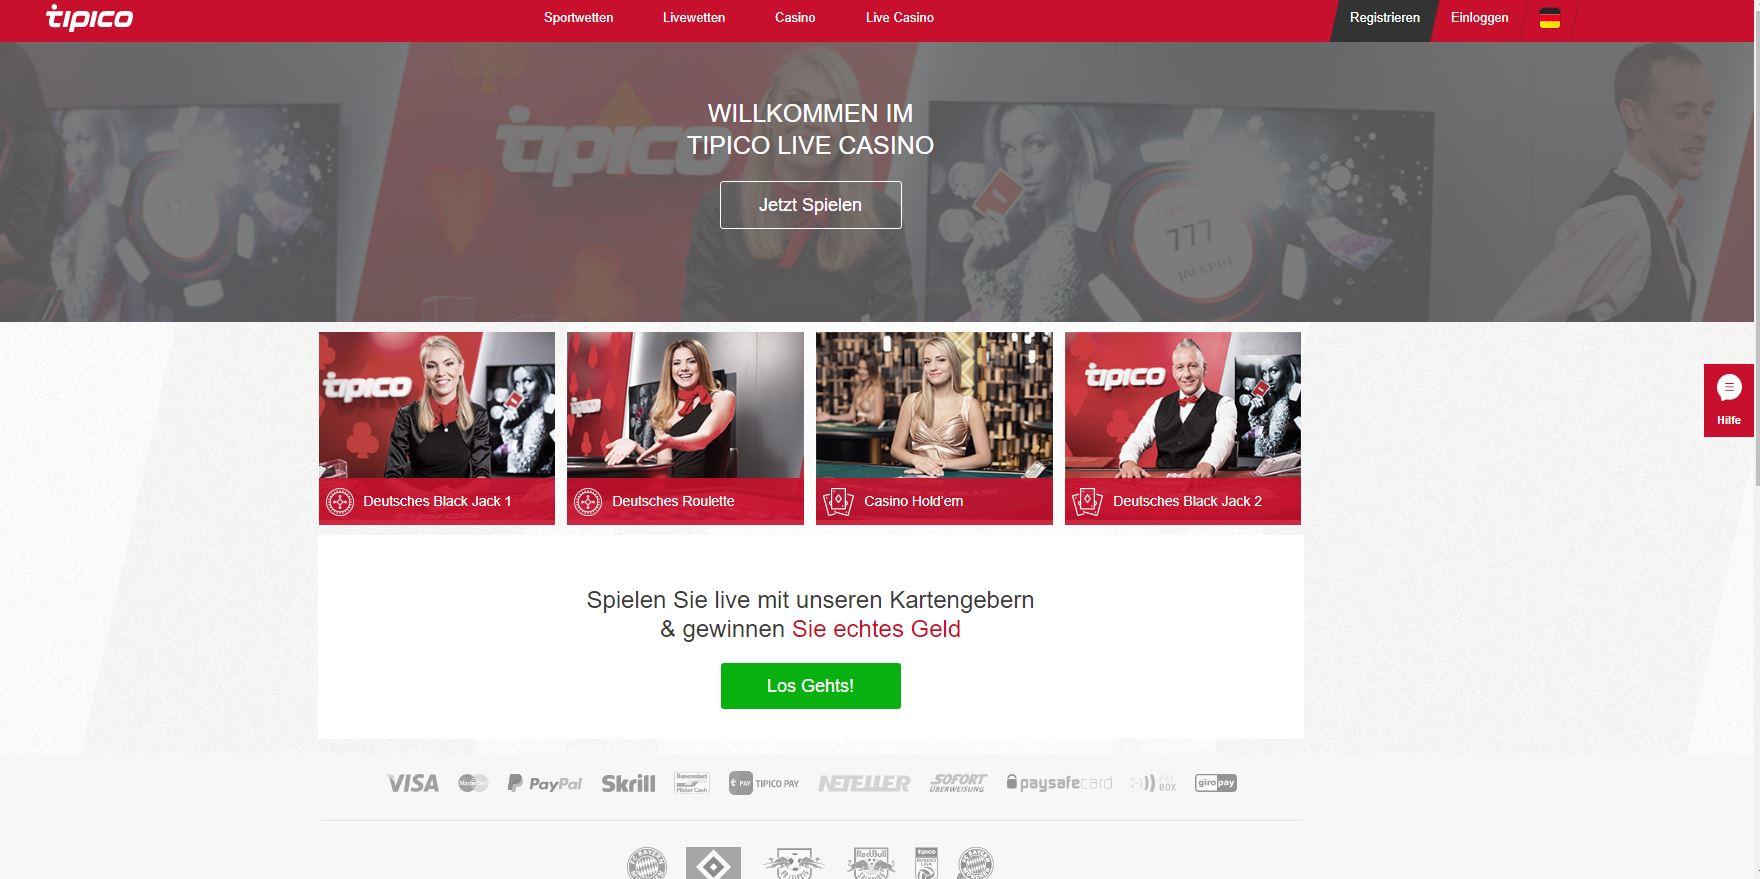 Tipico homepage